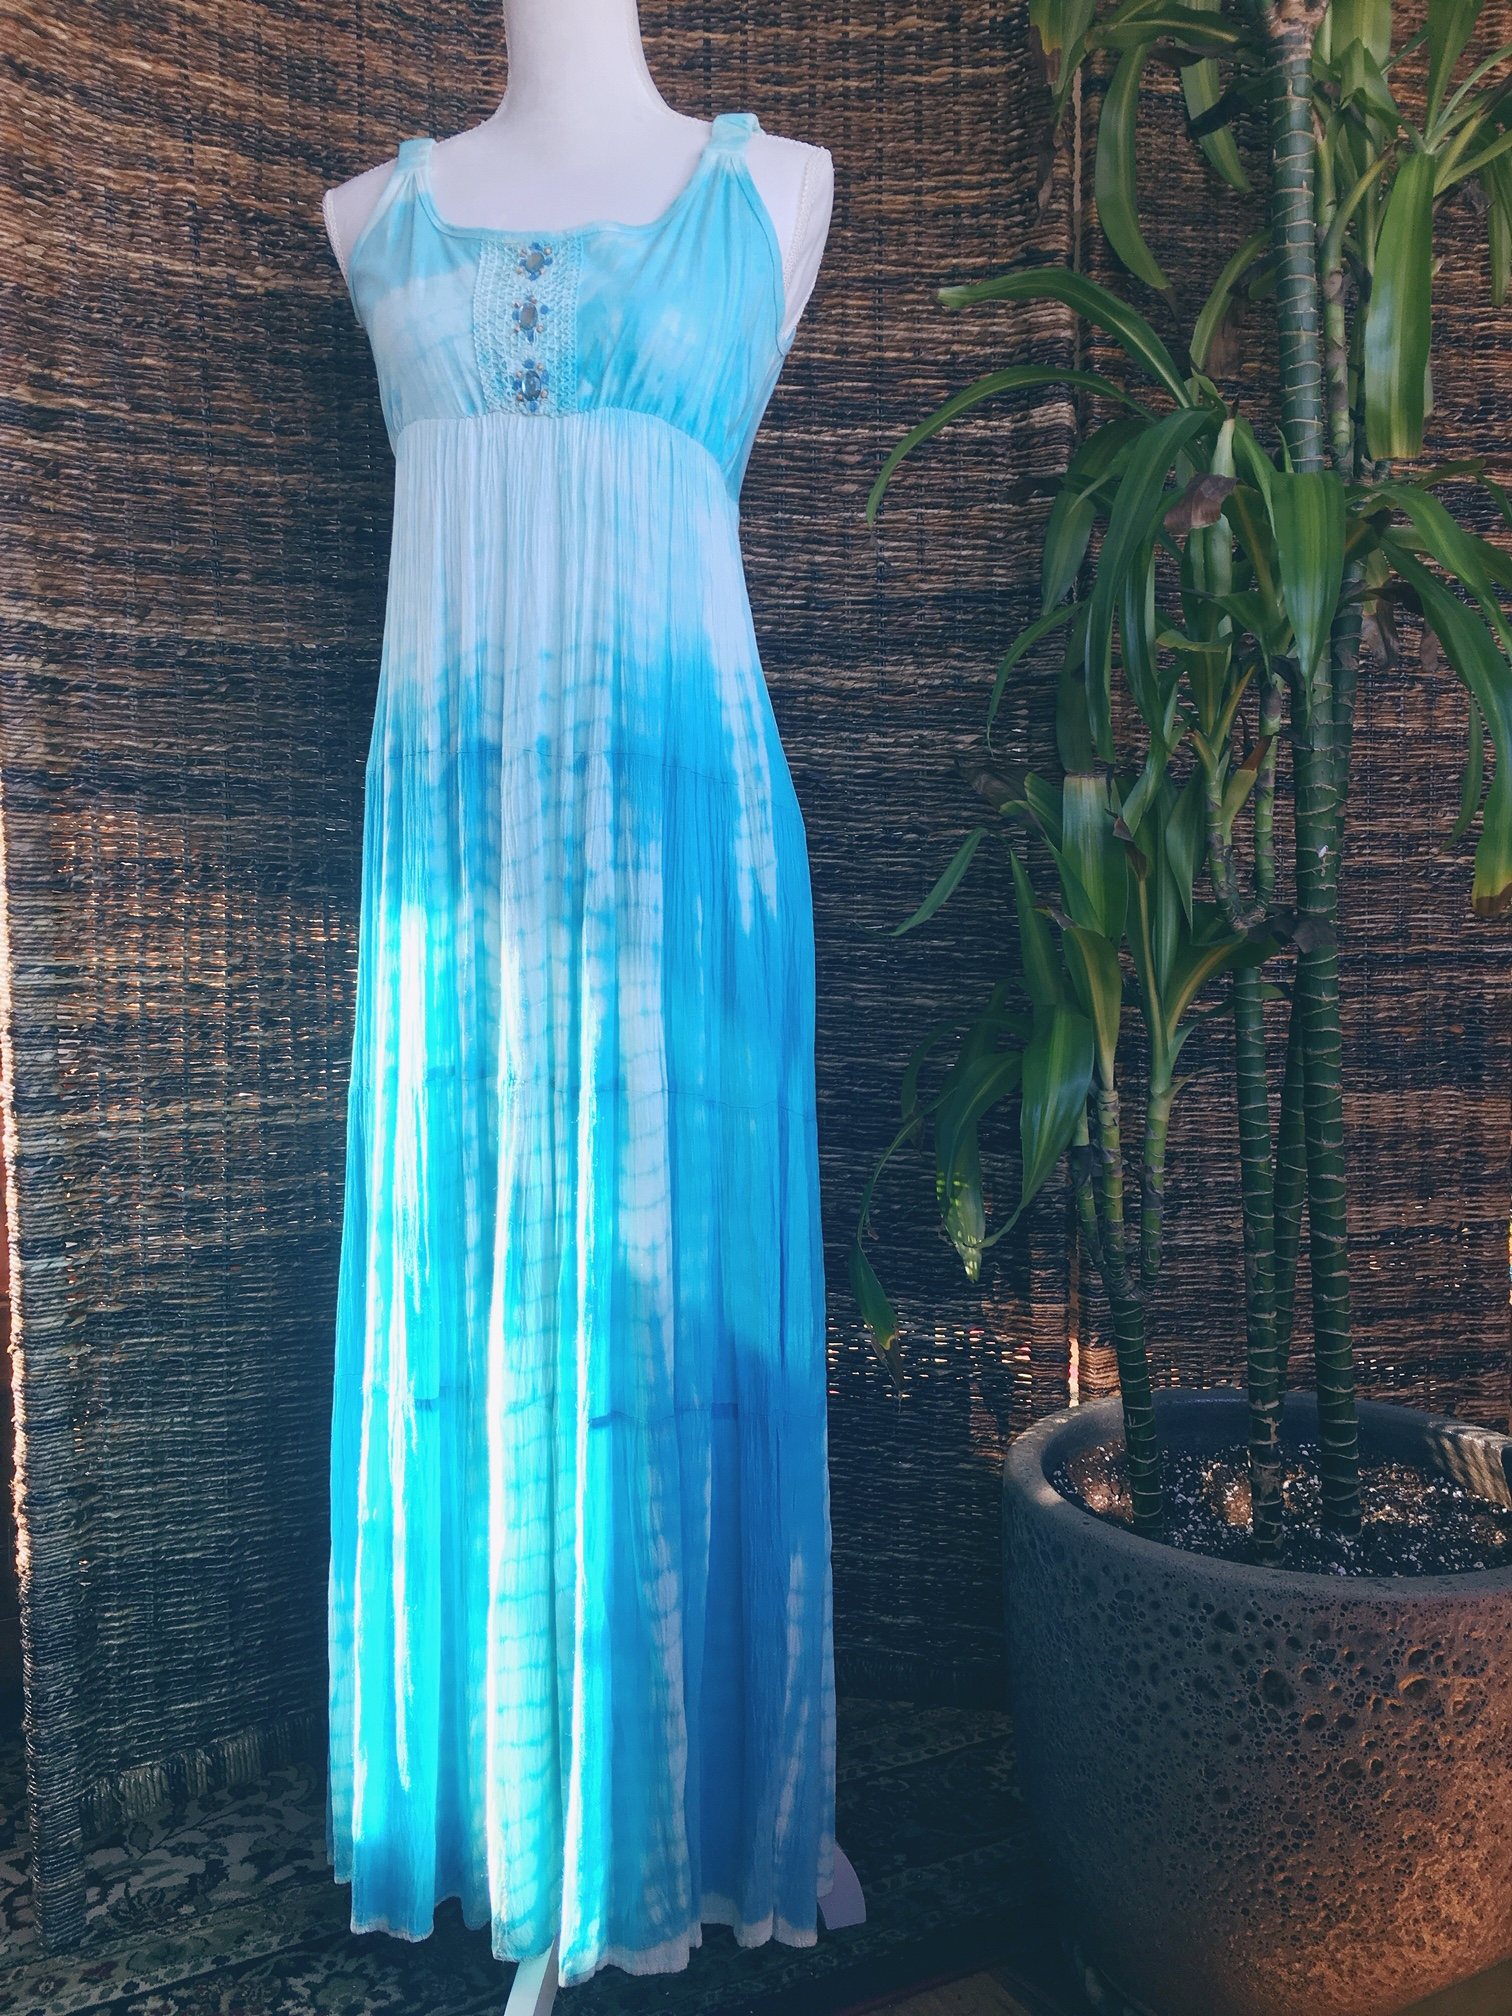 79e1c8a2449c2 S] Bead Embellished Blue Tie Dye Crinkle Fabric Maxi Dress on Storenvy